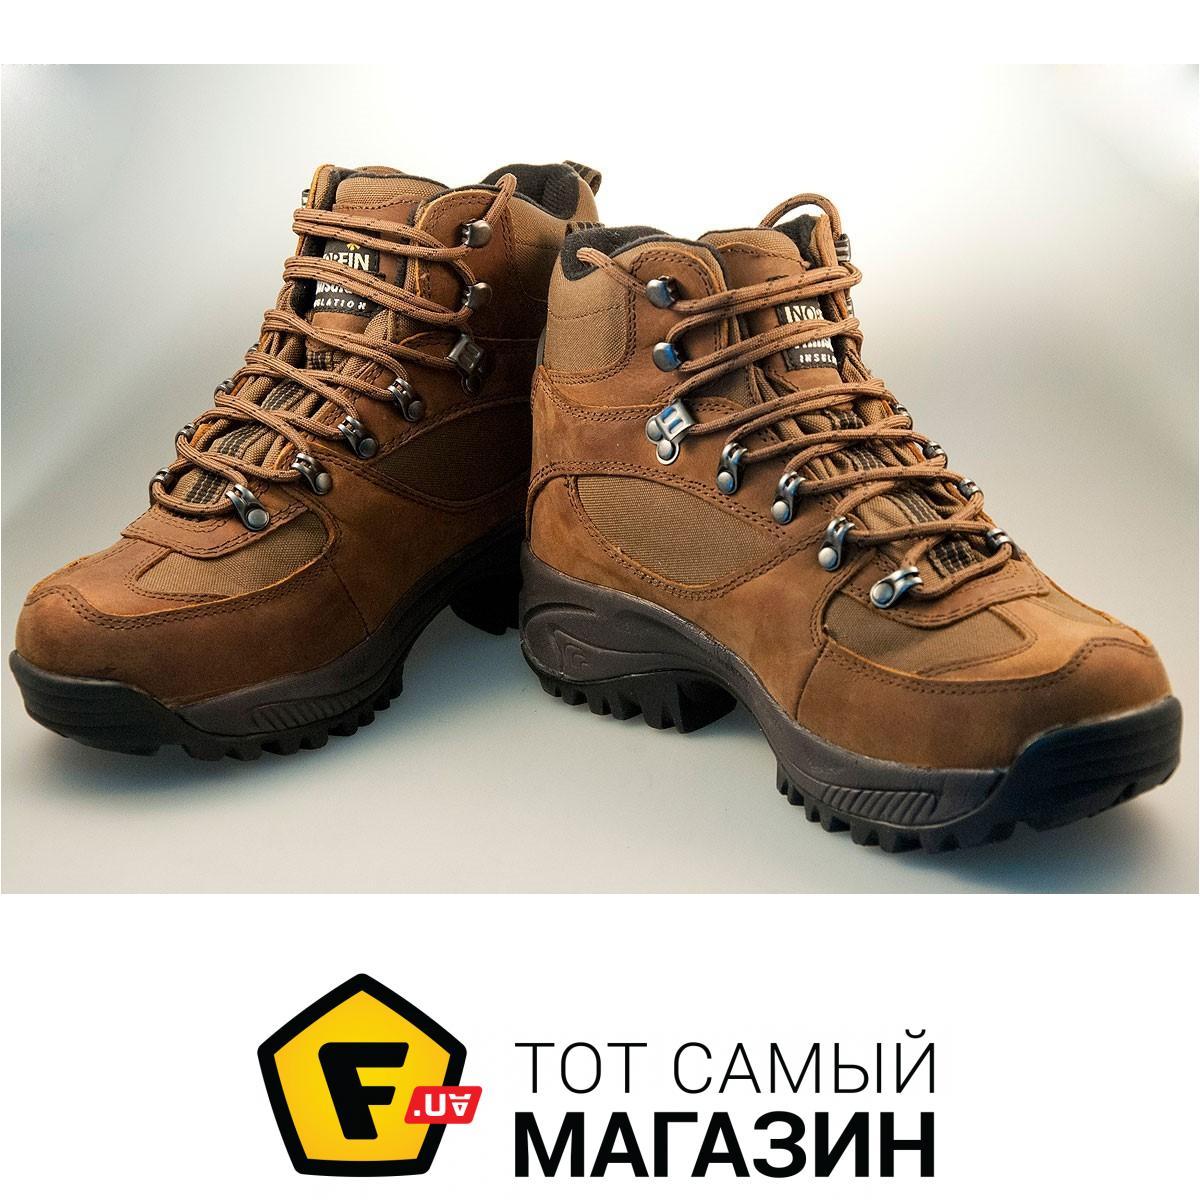 ... Трекинговые ботинки Norfin Scout 40 (13992-40) Тип  трекинговые  ботинки b150539d102f3